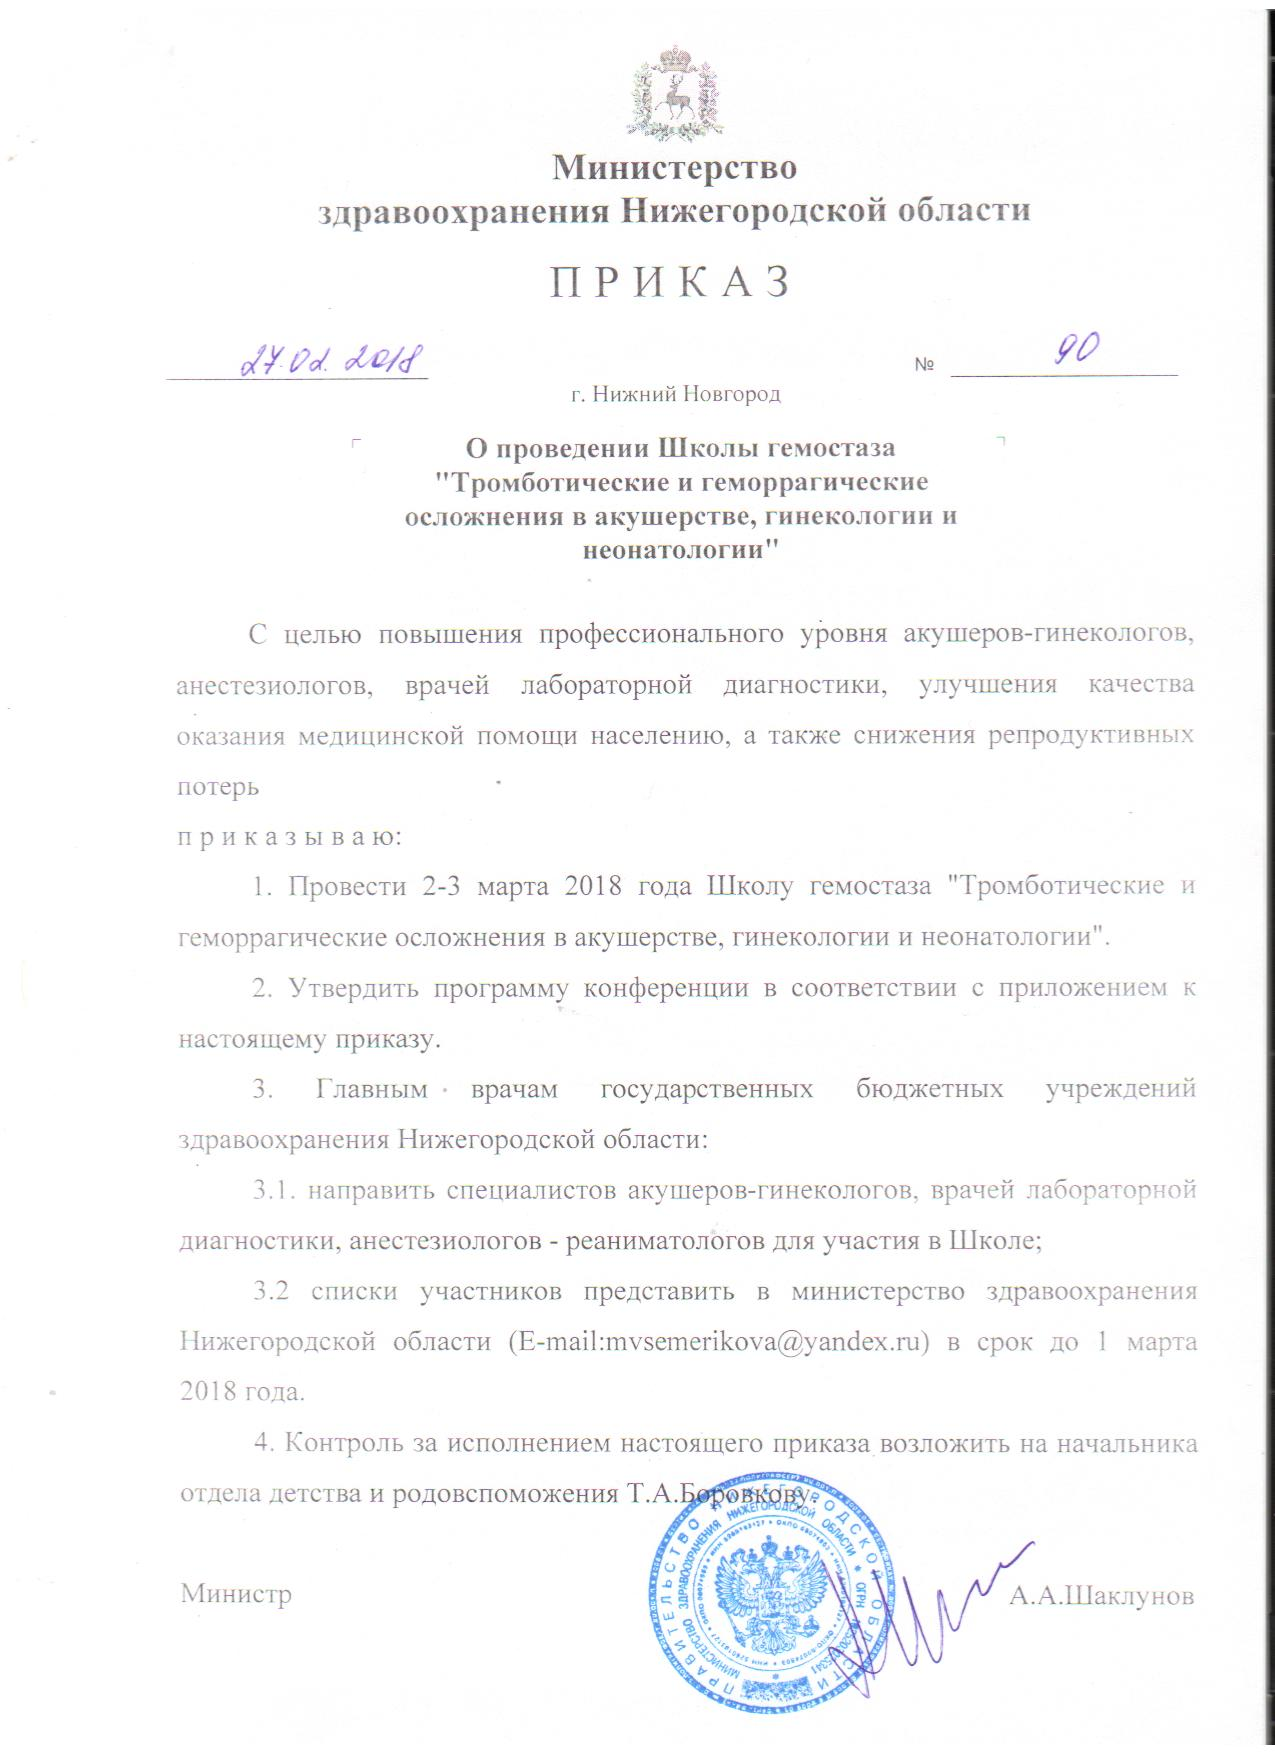 _HemostasisSchool-NNovgorod-order